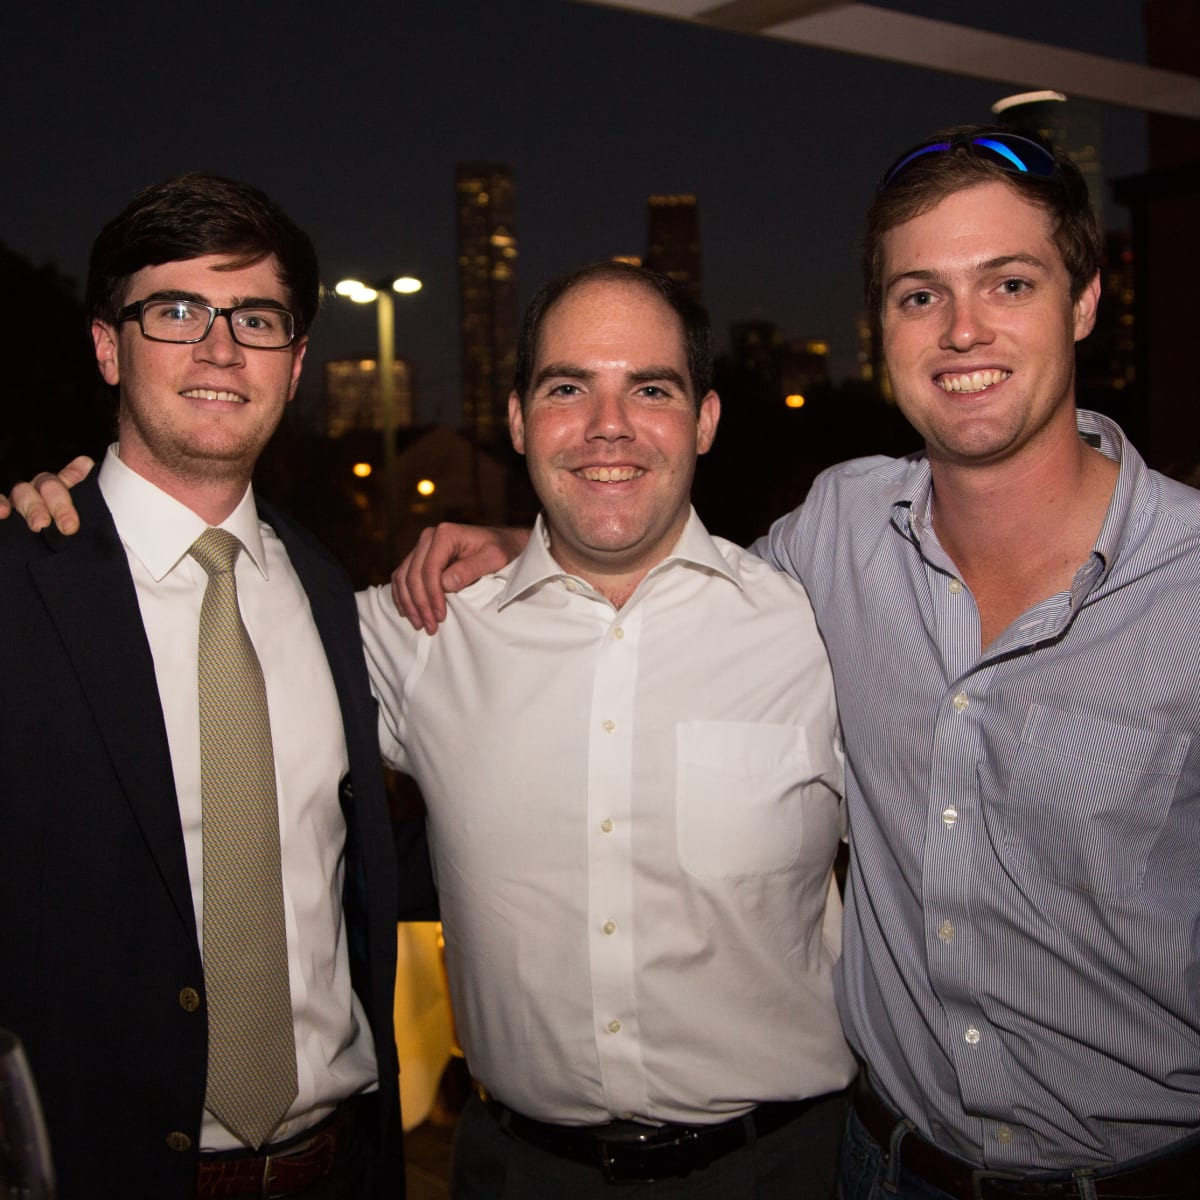 B&B Butchers terrace party  James Moreton, Jon Sanfelippo and Joseph Doyle